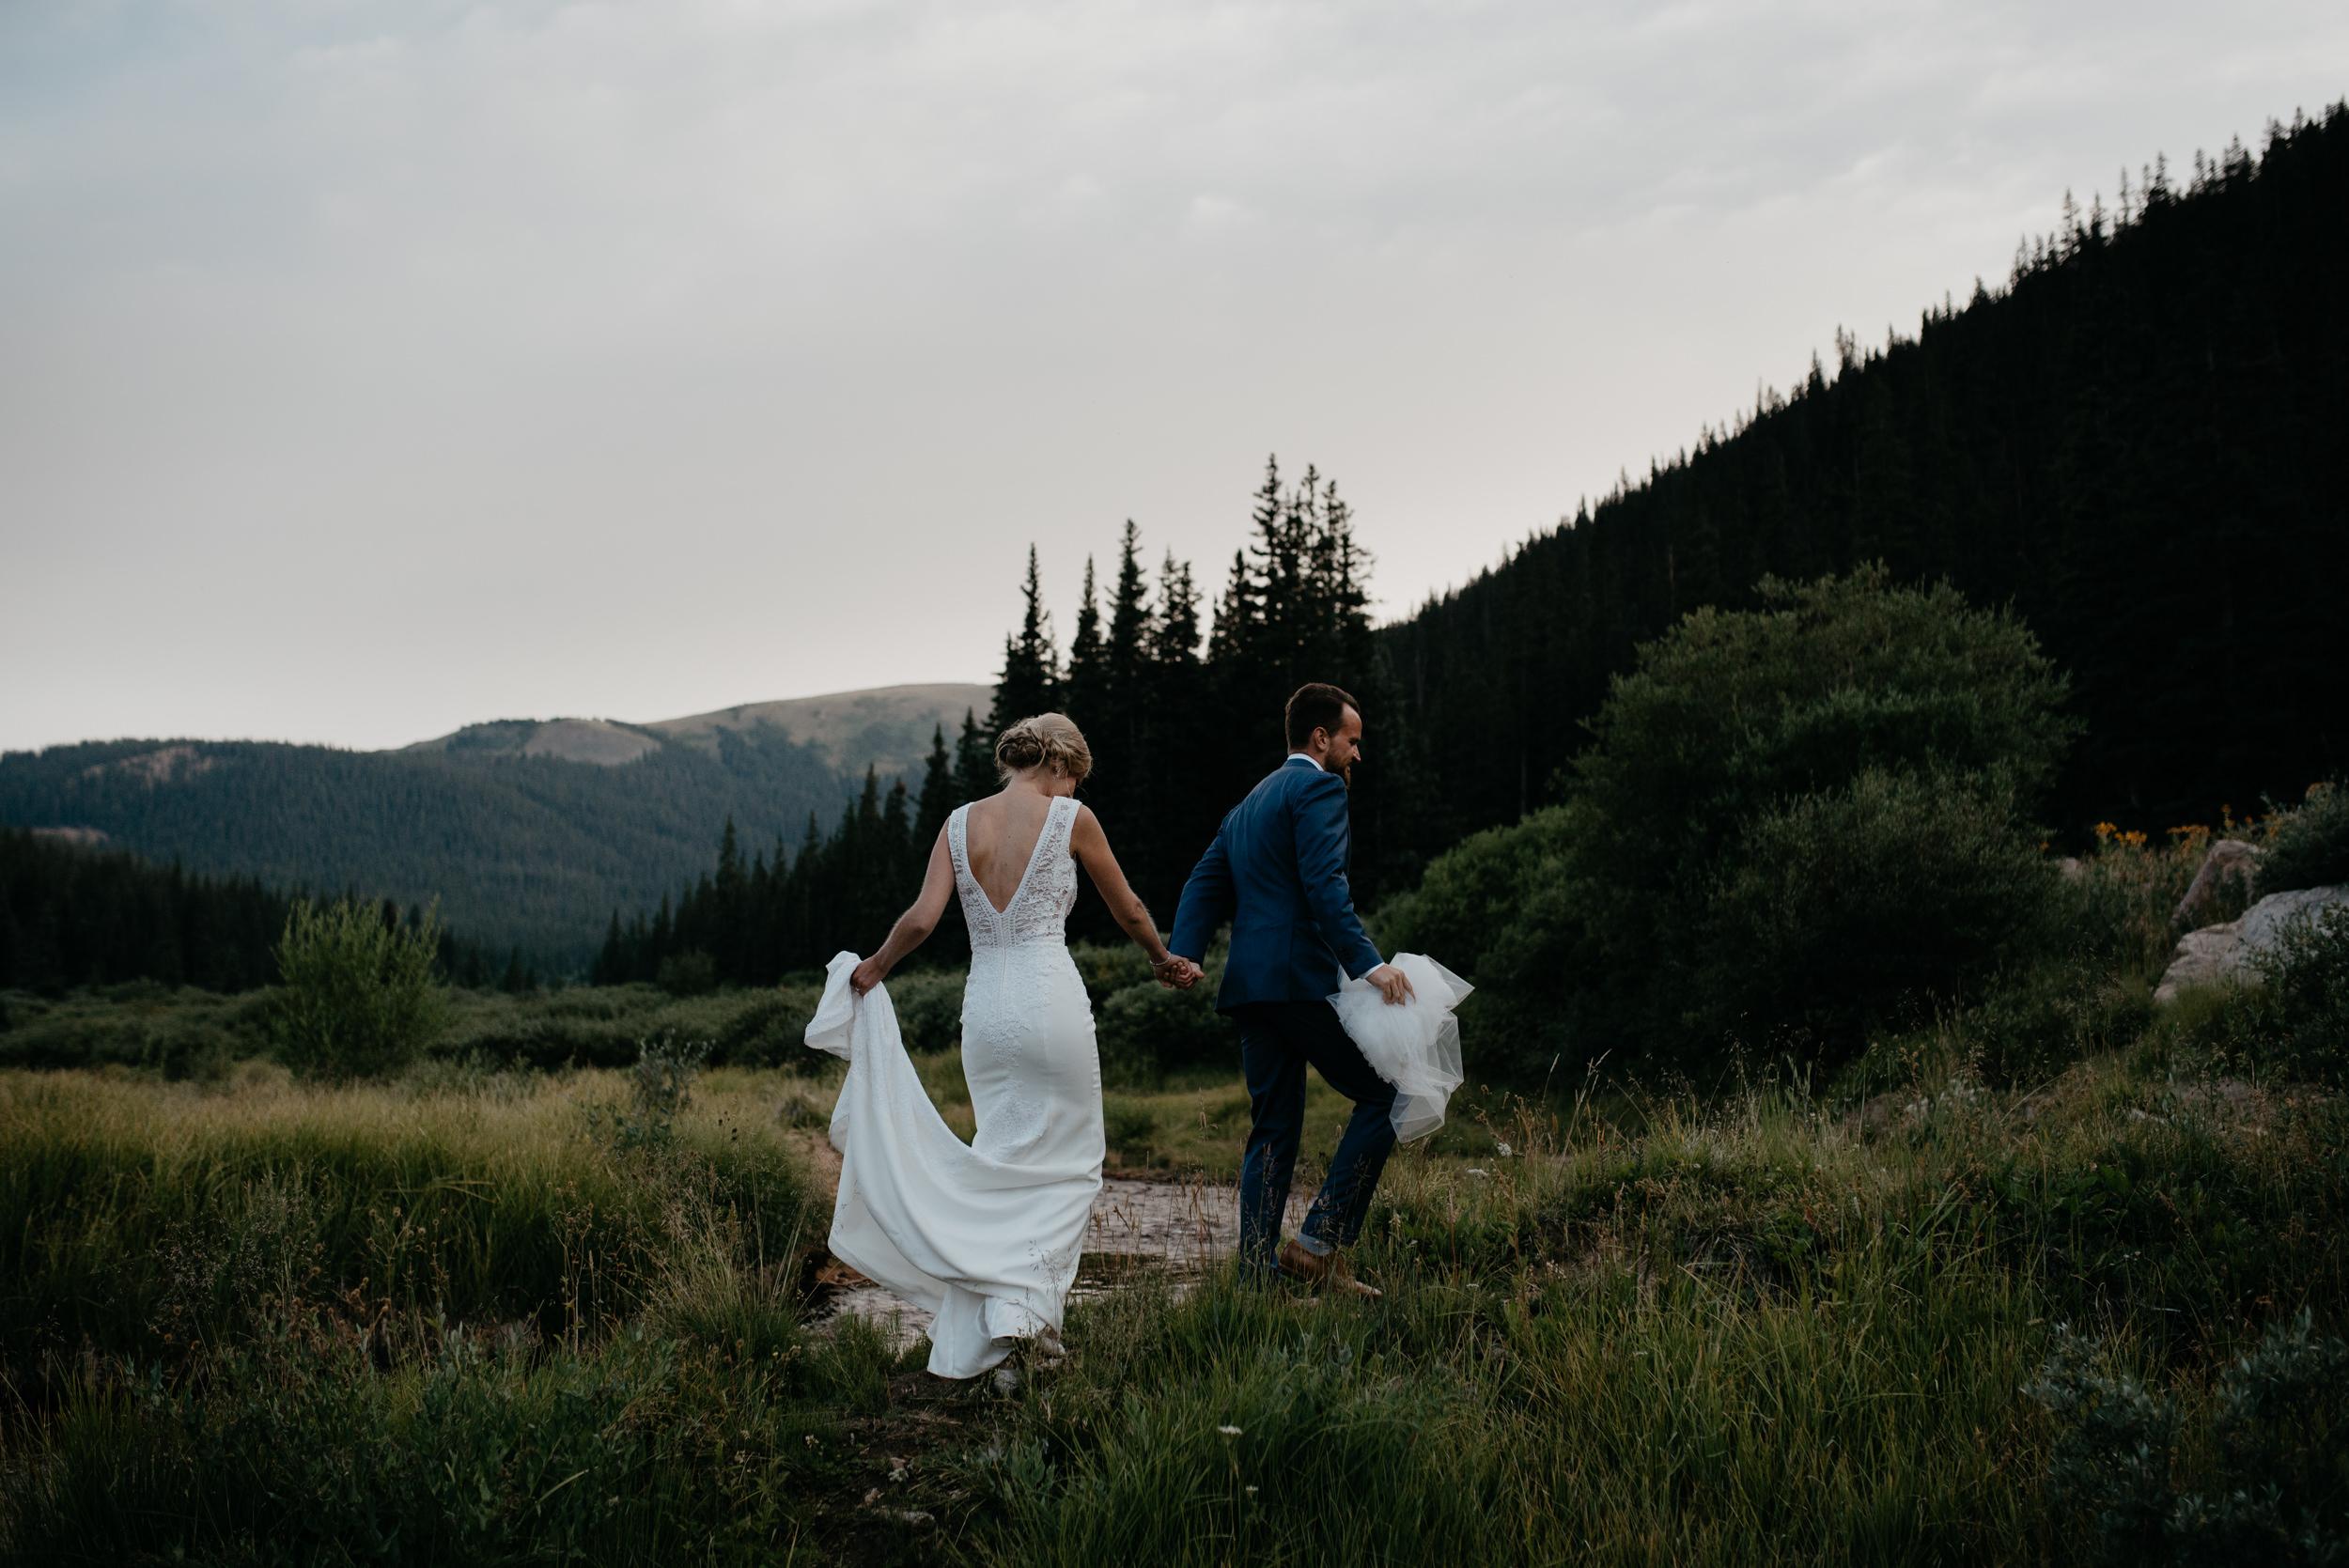 Colorado based adventure wedding and elopement photographer.